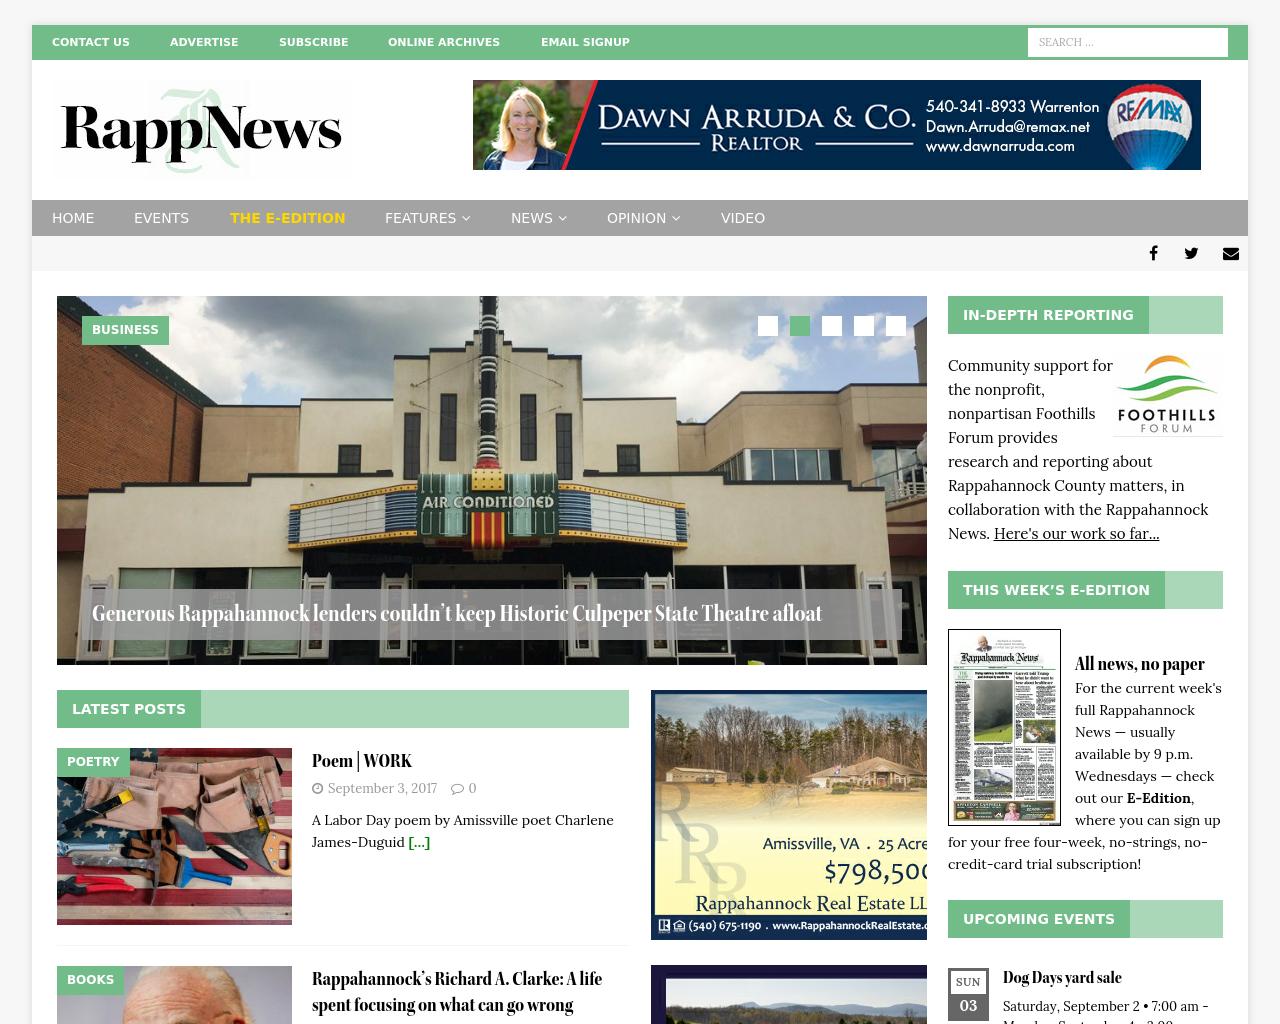 Rappnews.com-Advertising-Reviews-Pricing